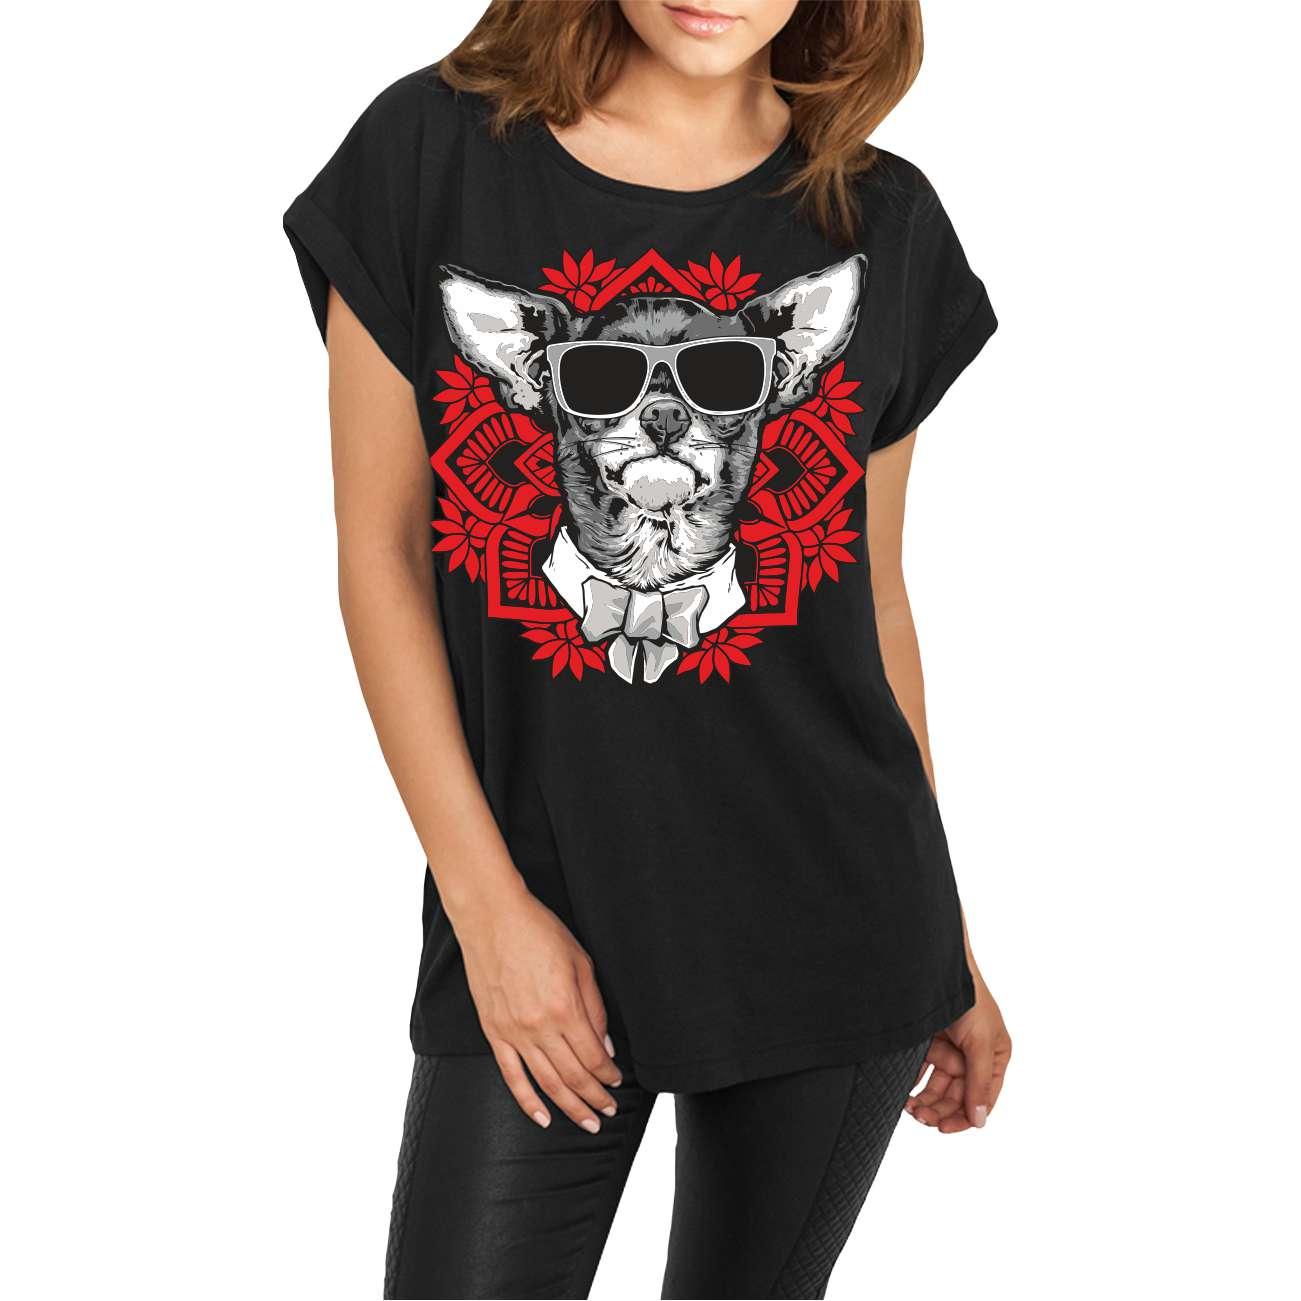 XS 2XL Frauen Damen Langarm Shirt My Chihuahua Dogs Rasse Hunde Welpe Gr